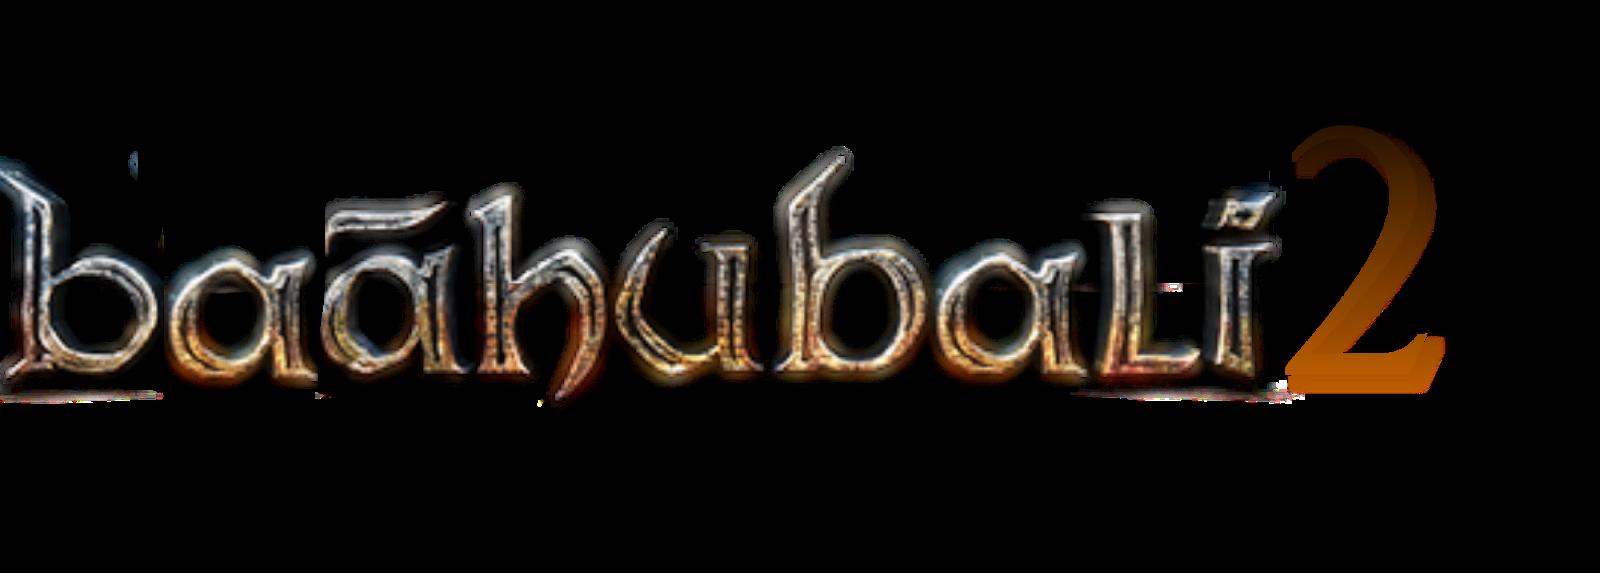 Baahubali 2- The Conclusion